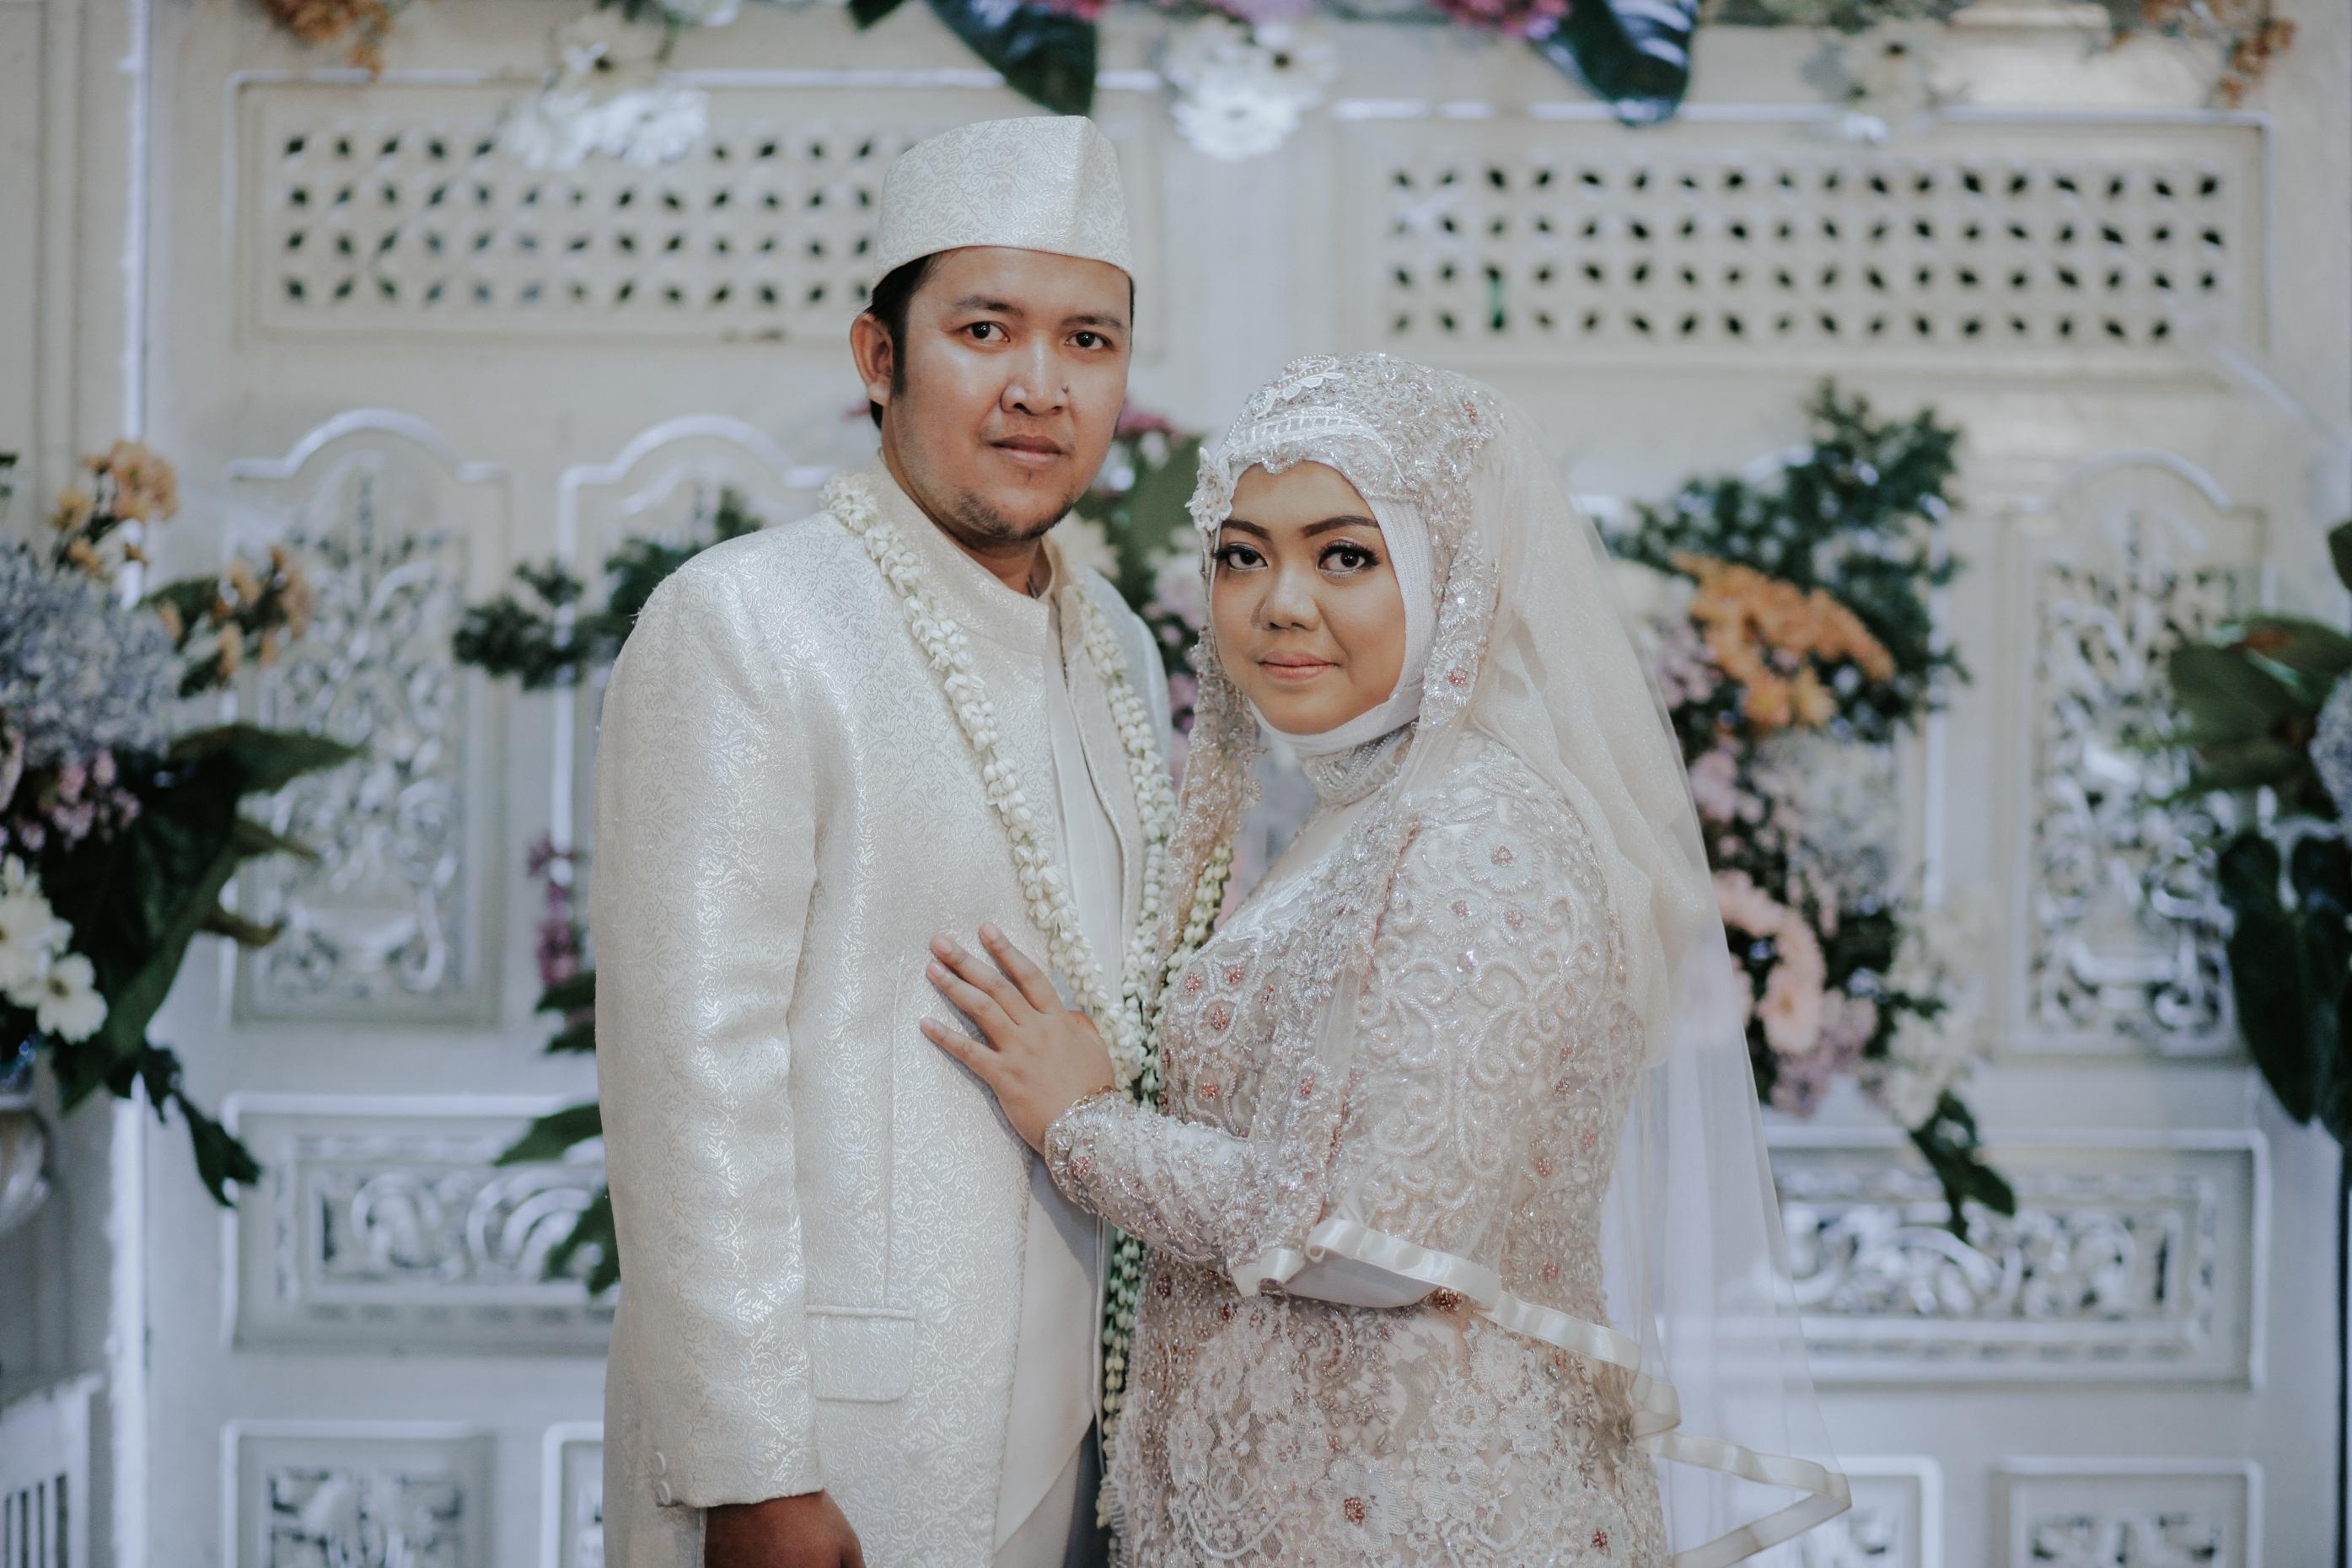 Kebaya Muslimah Big Size Fajar & Taufik by LAKSMI 9 9 9